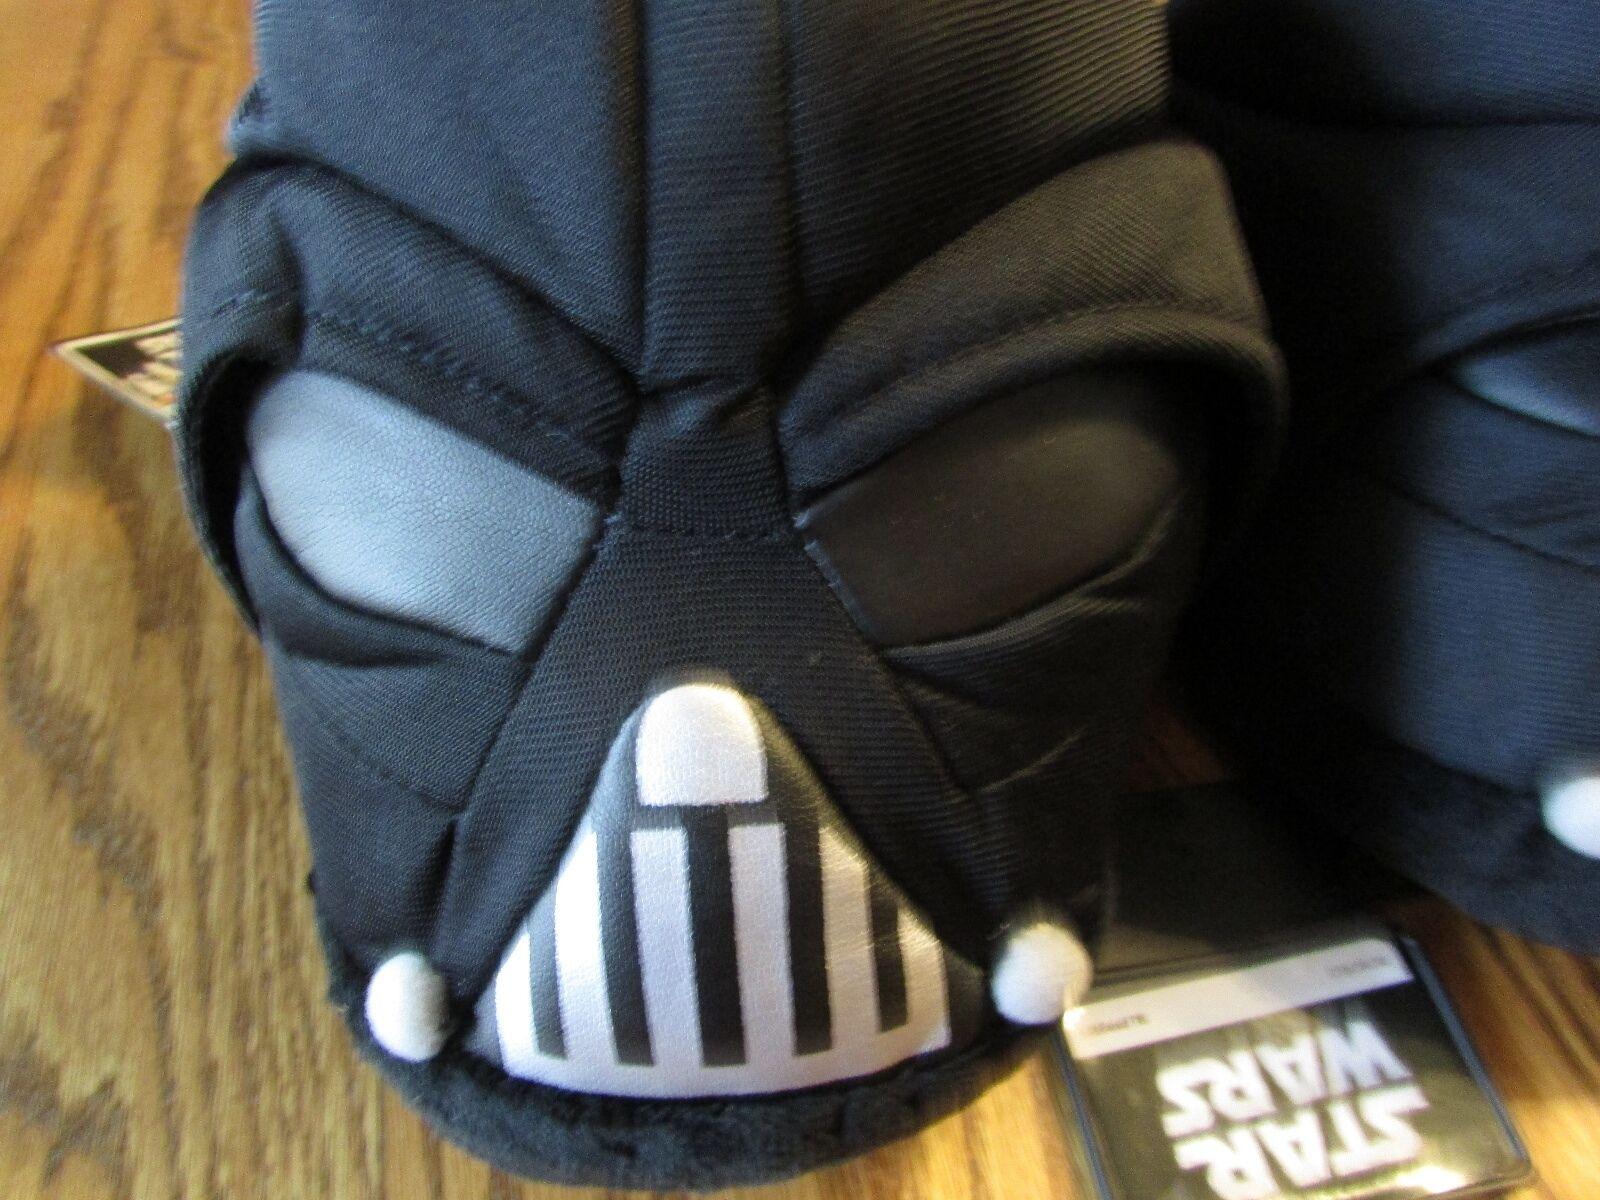 Star Wars DARTH VADER  Men's Plush SLIPPERS Size L, NWT $45